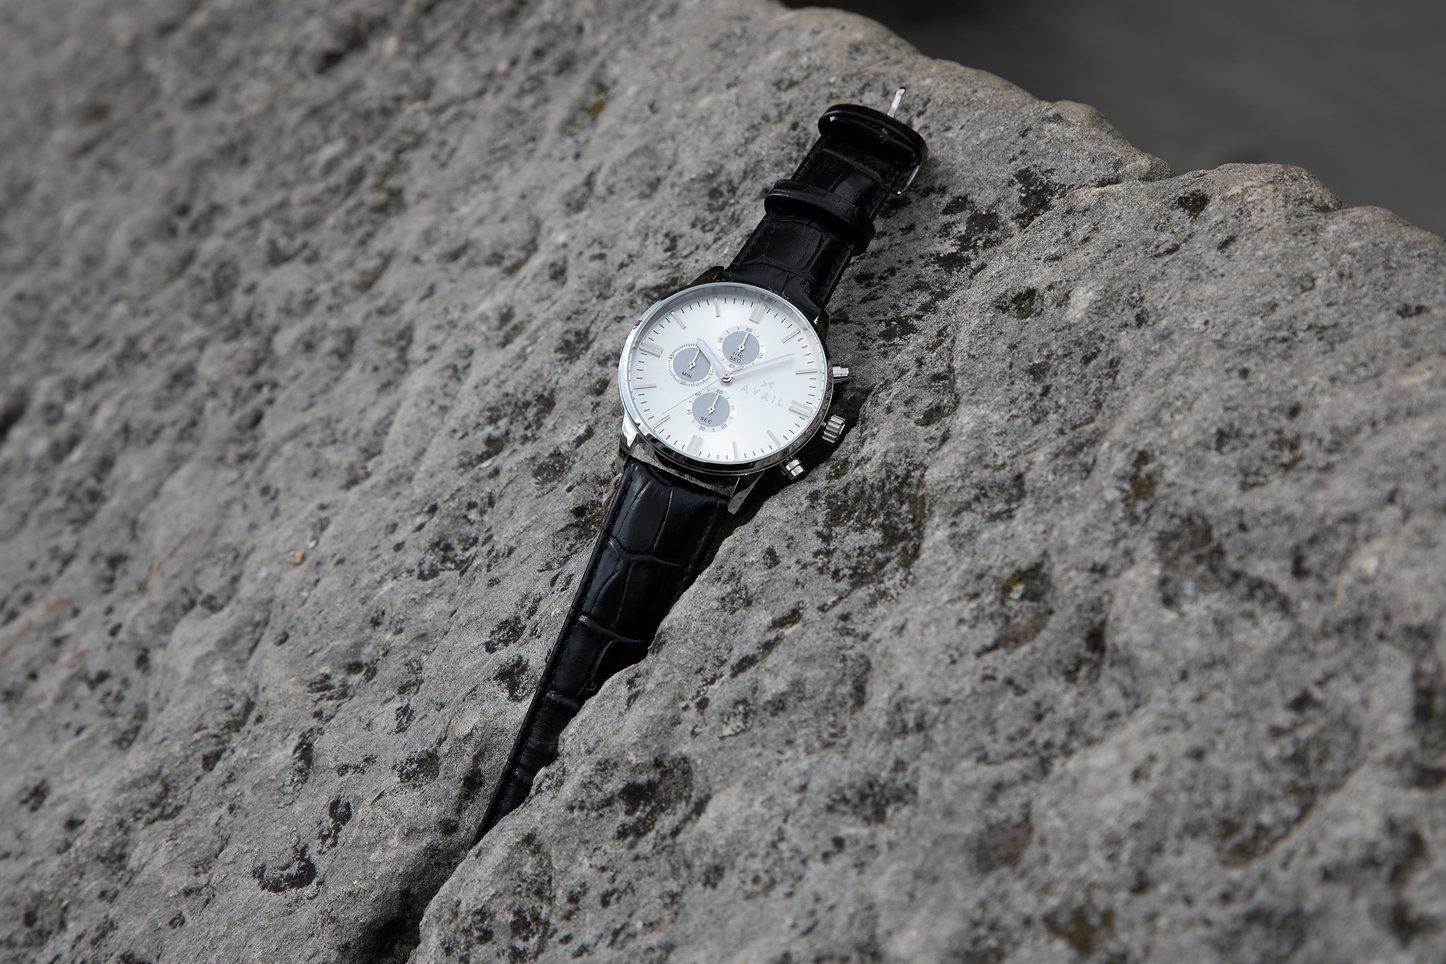 Chronograph in Black in grey rock.jpg